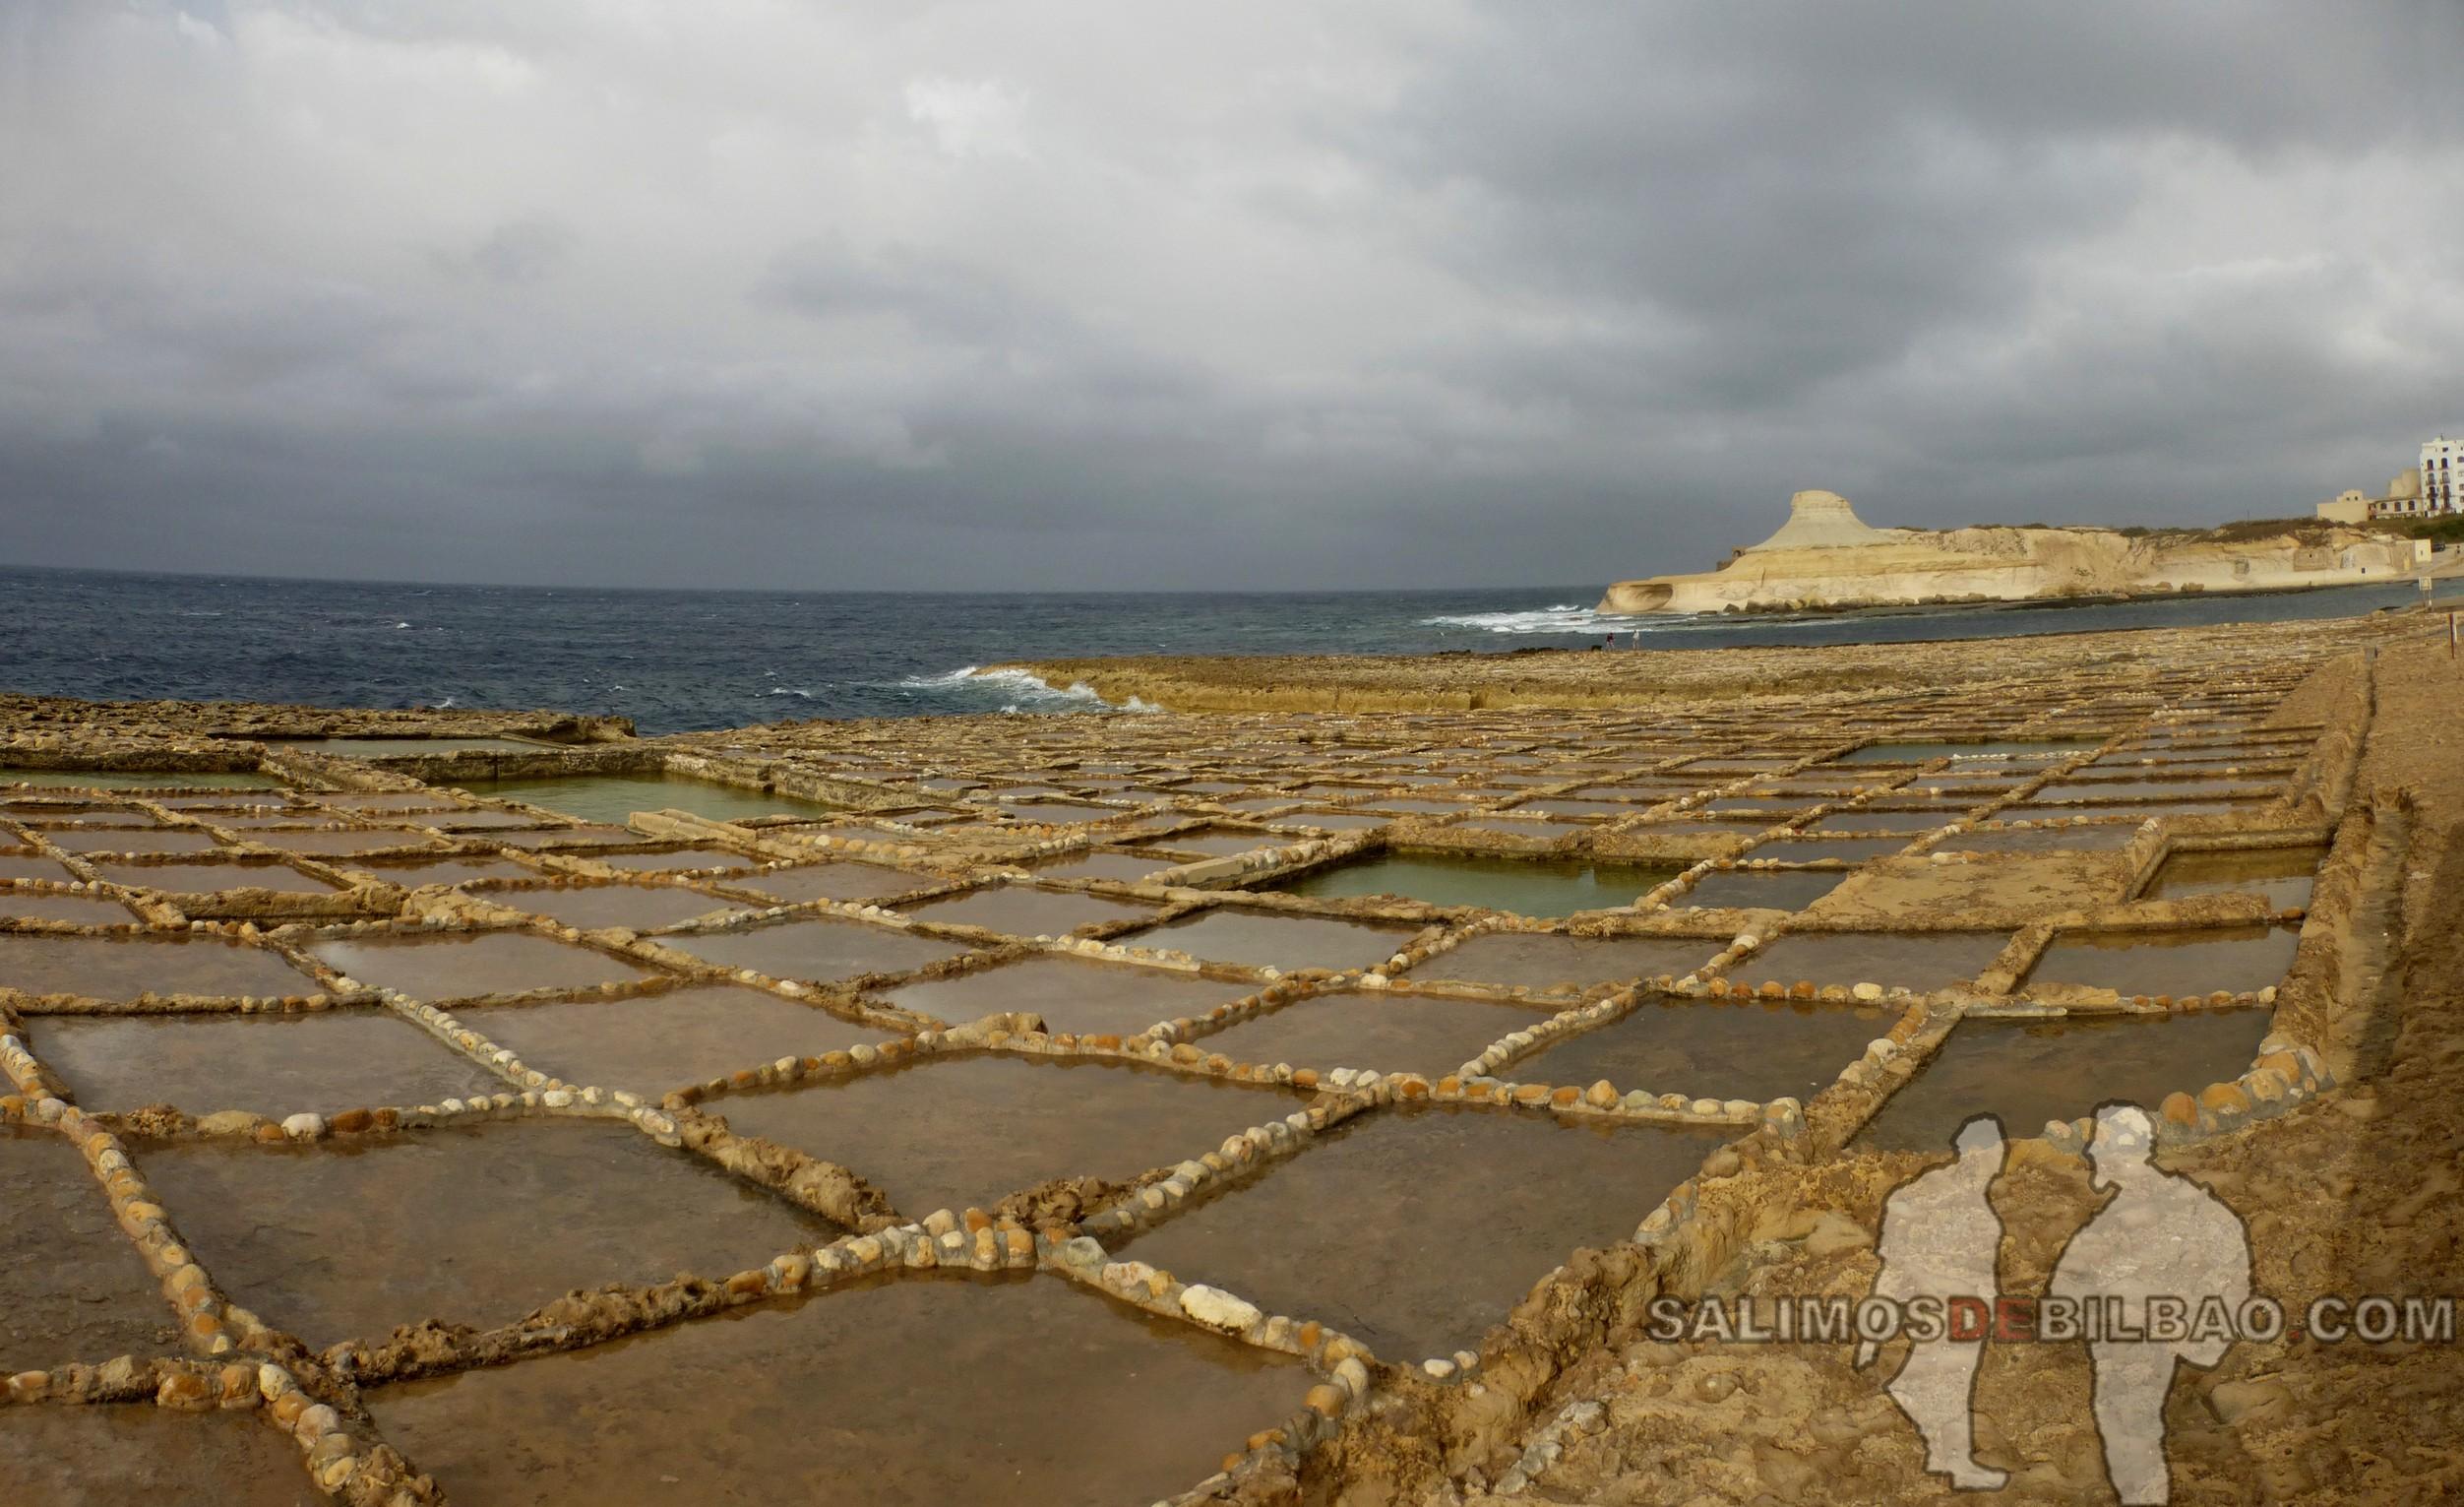 0444. Pano, Salinas, Xwejni Bay, Gozo